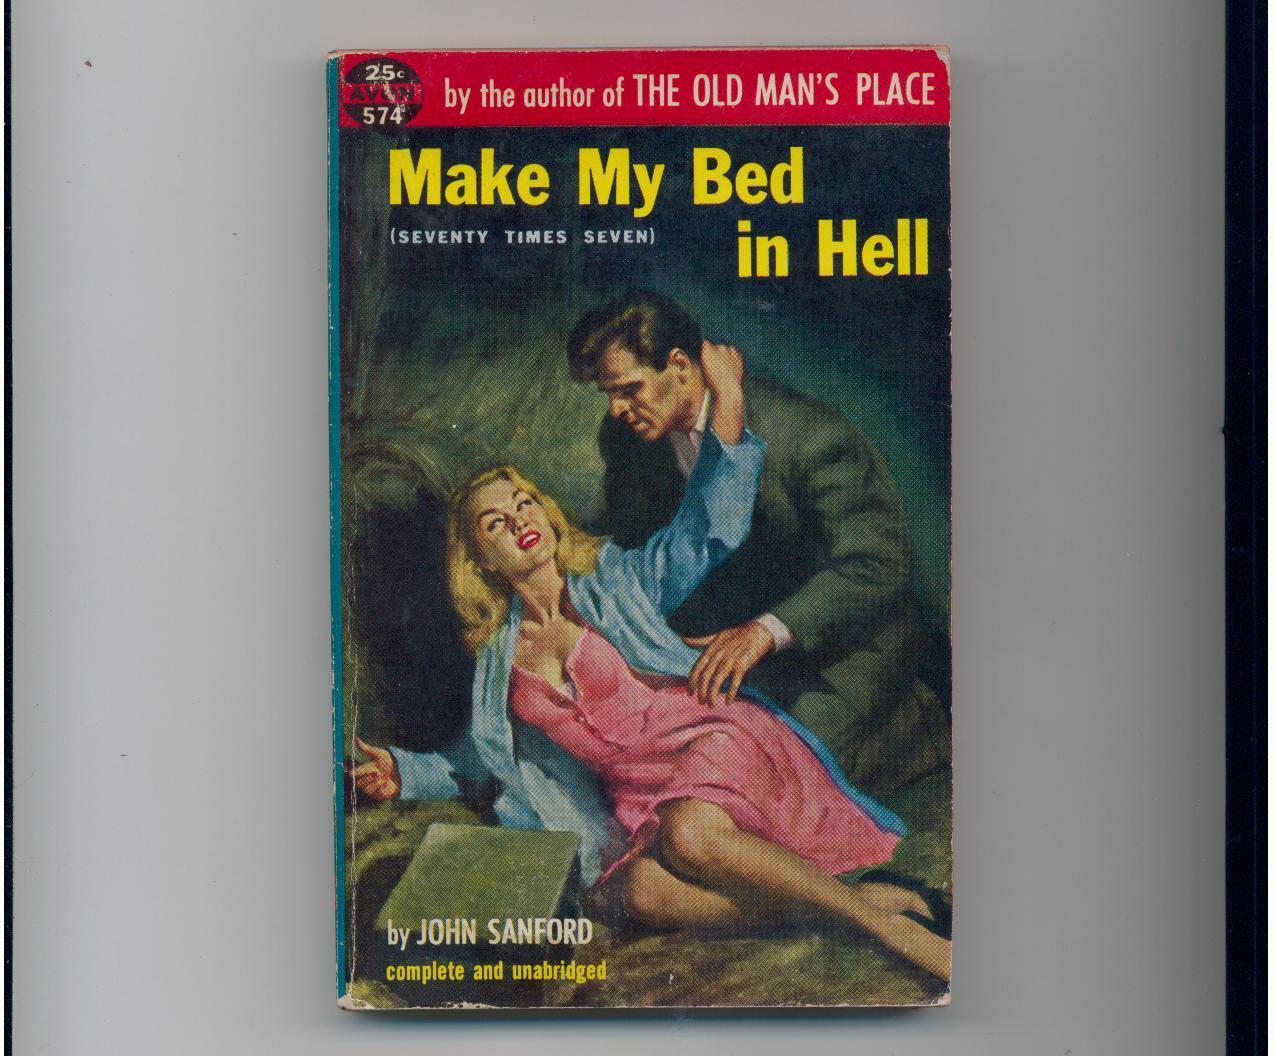 Sanford - MAKE MY BED IN HELL - 1954 - 1st paperback pr.